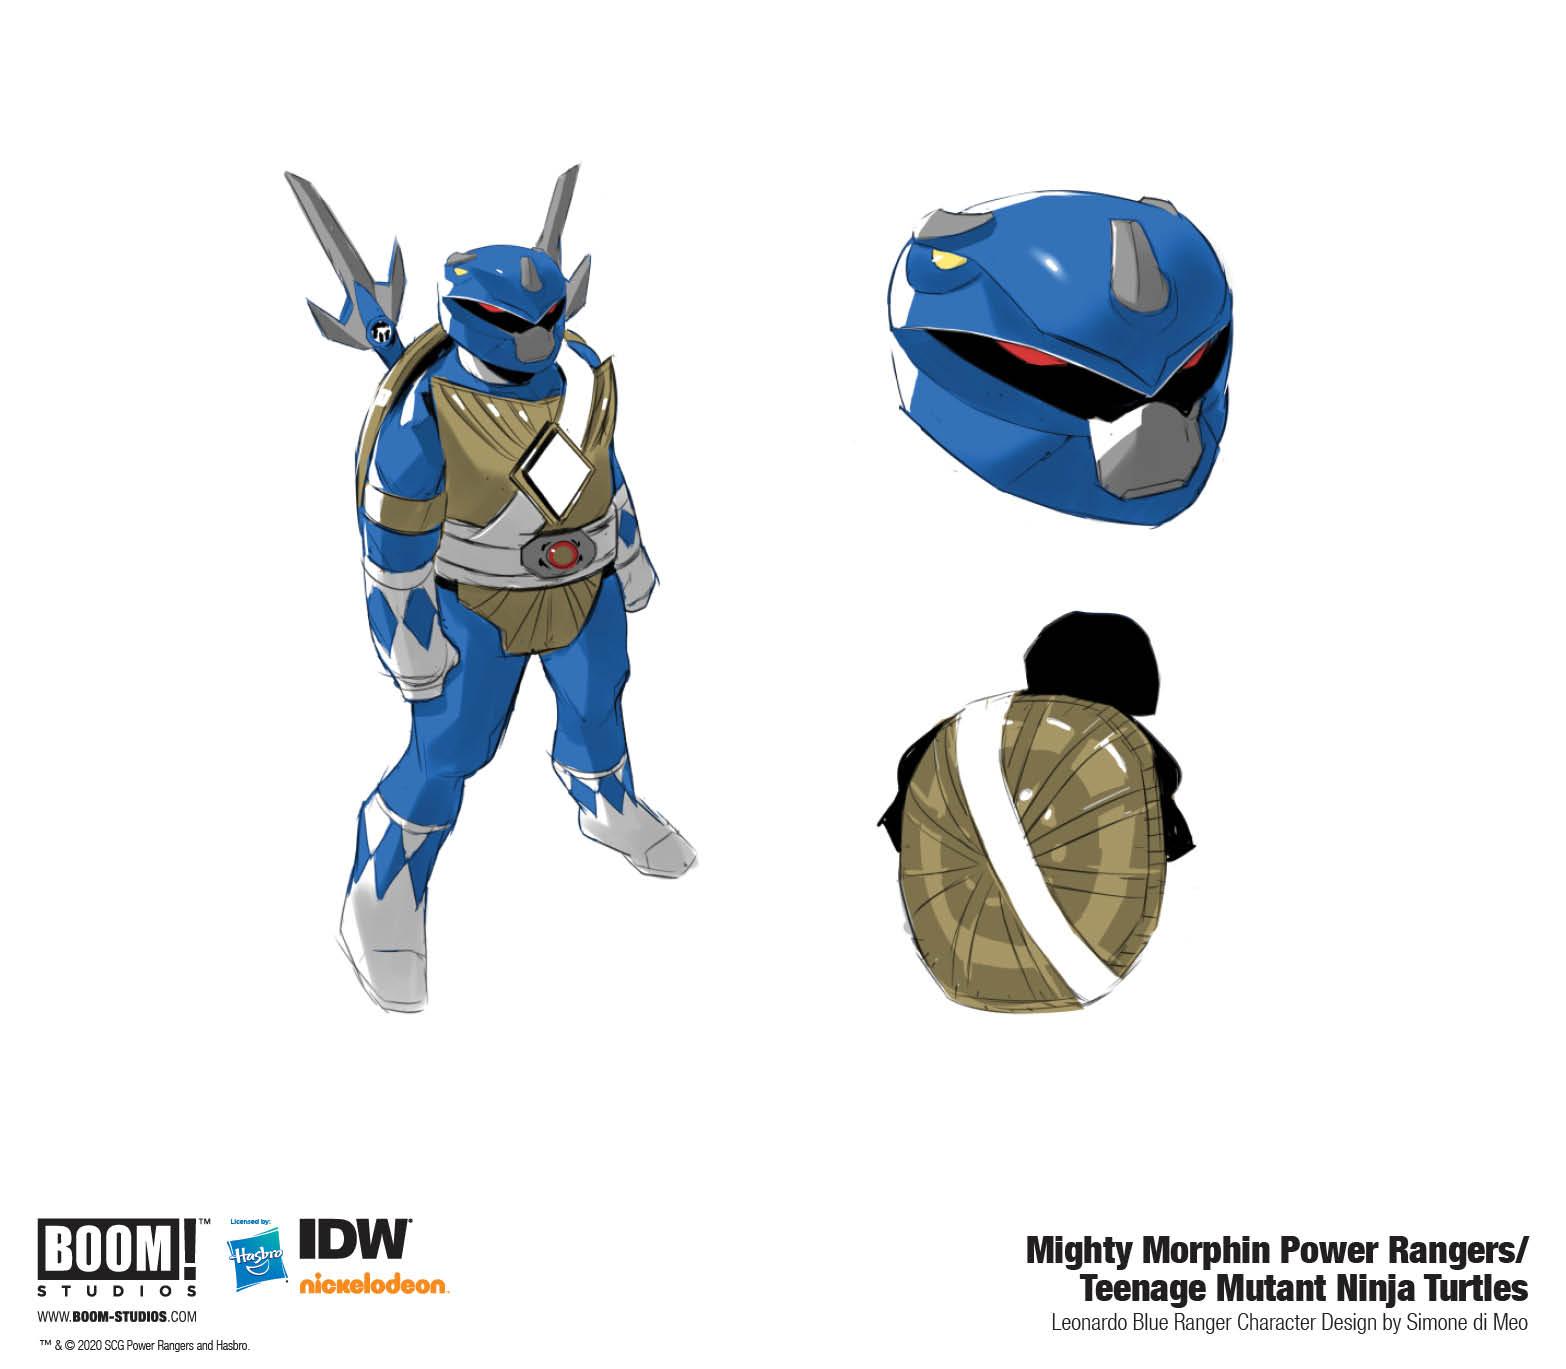 Illustration: IDW/Boom! Studios